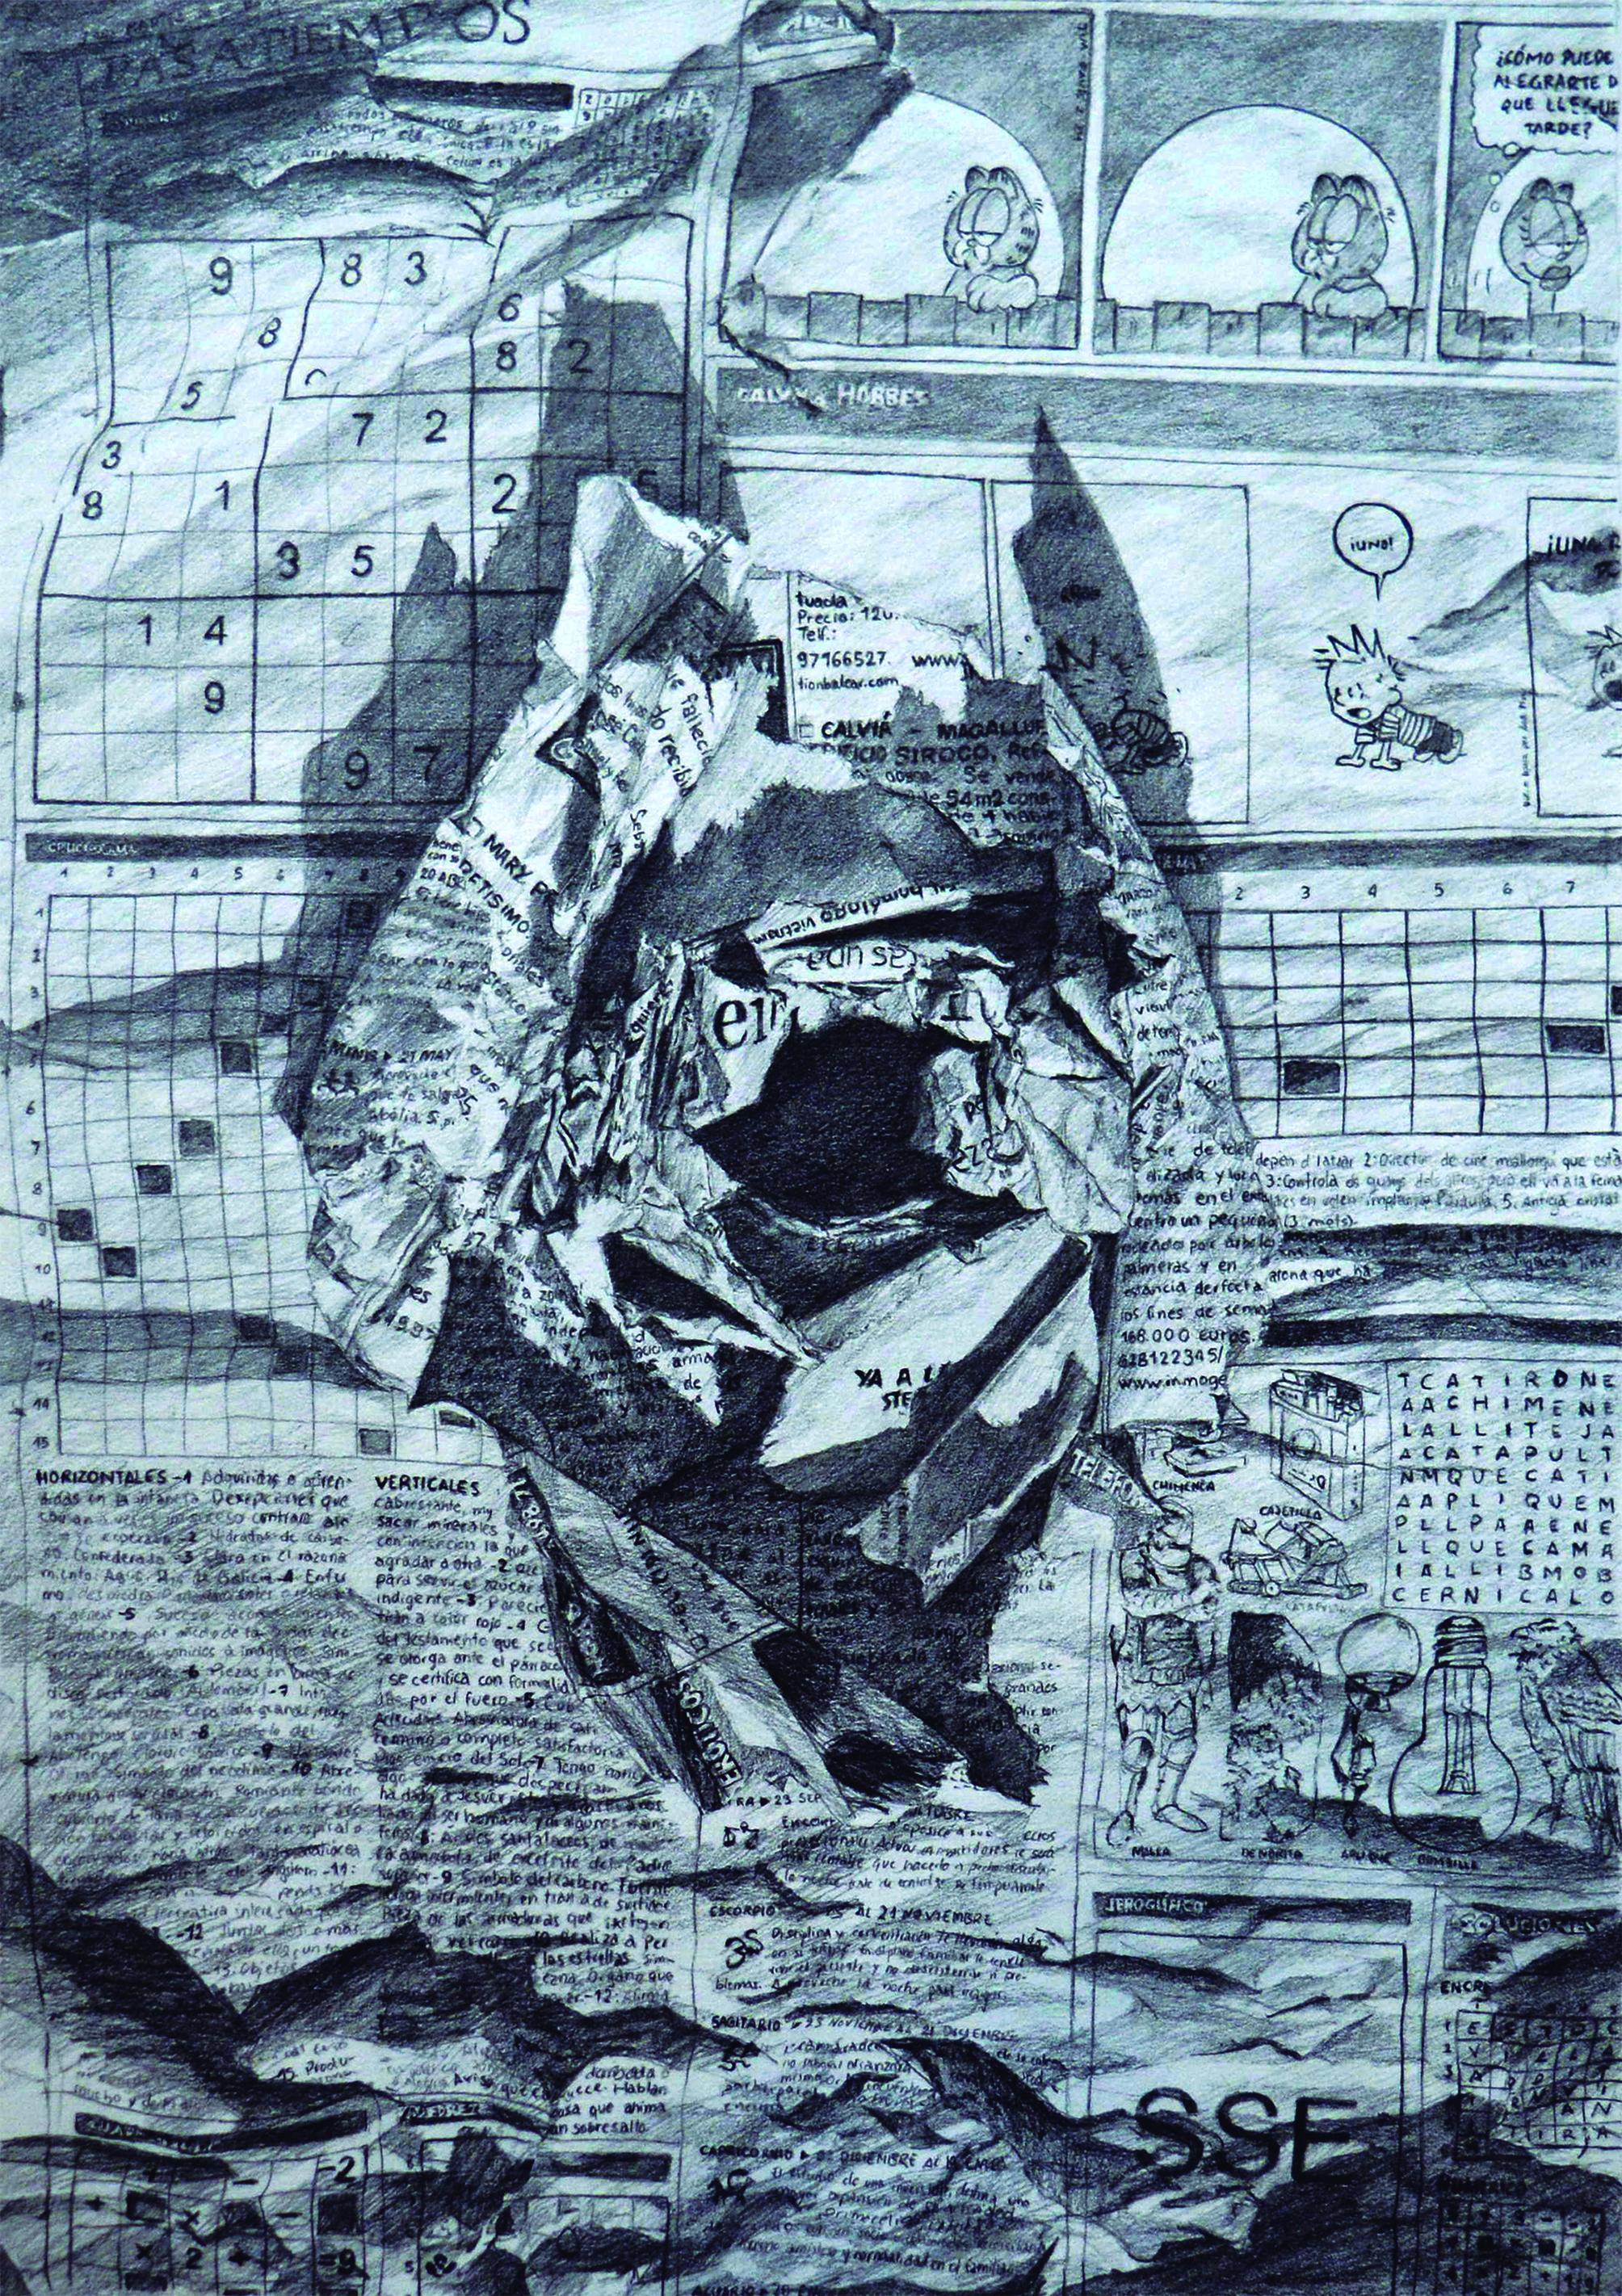 Marta Ruiz Anguera_Pasatiempo_2016_29.7x21cm_ Graphite on paper.jpg